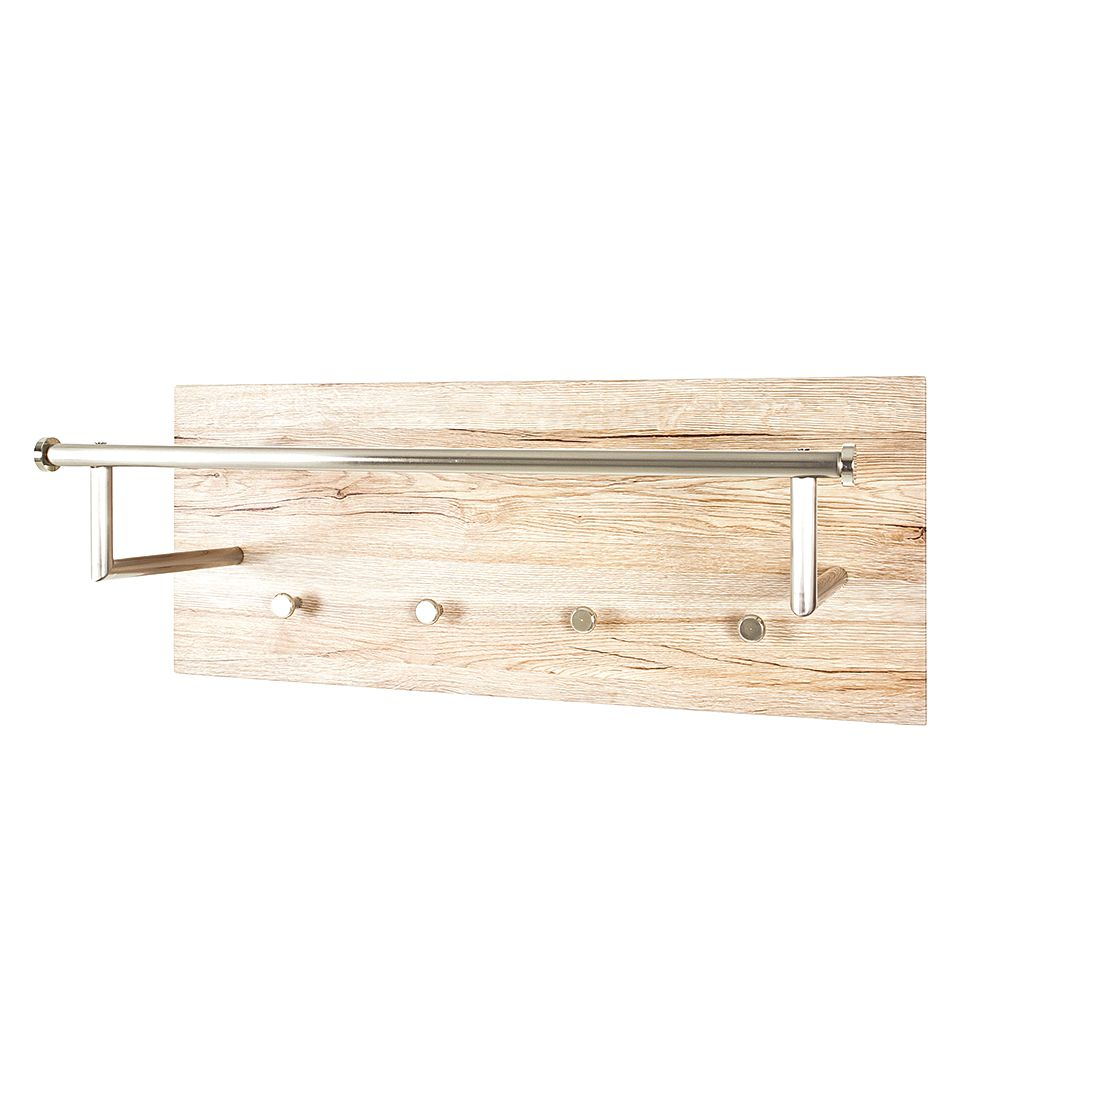 wandgarderobe felipe i edelstahl eiche sanremo dekor. Black Bedroom Furniture Sets. Home Design Ideas